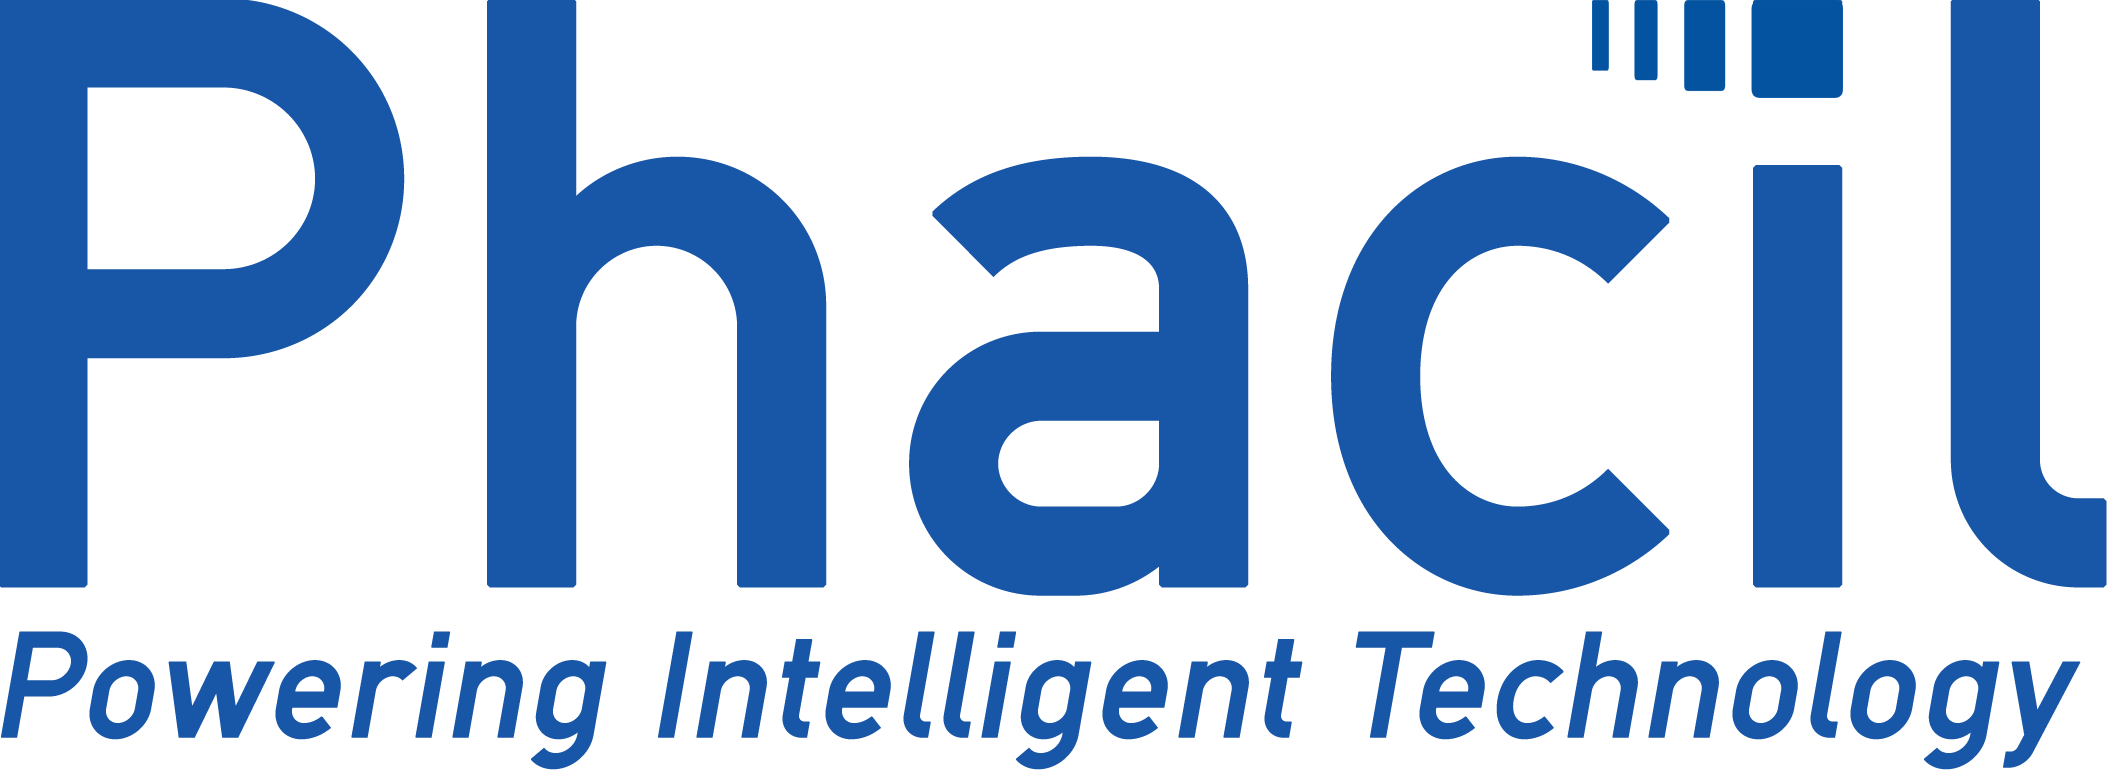 Phacil 2019 Logo Reflex Blue Hex 0054A3